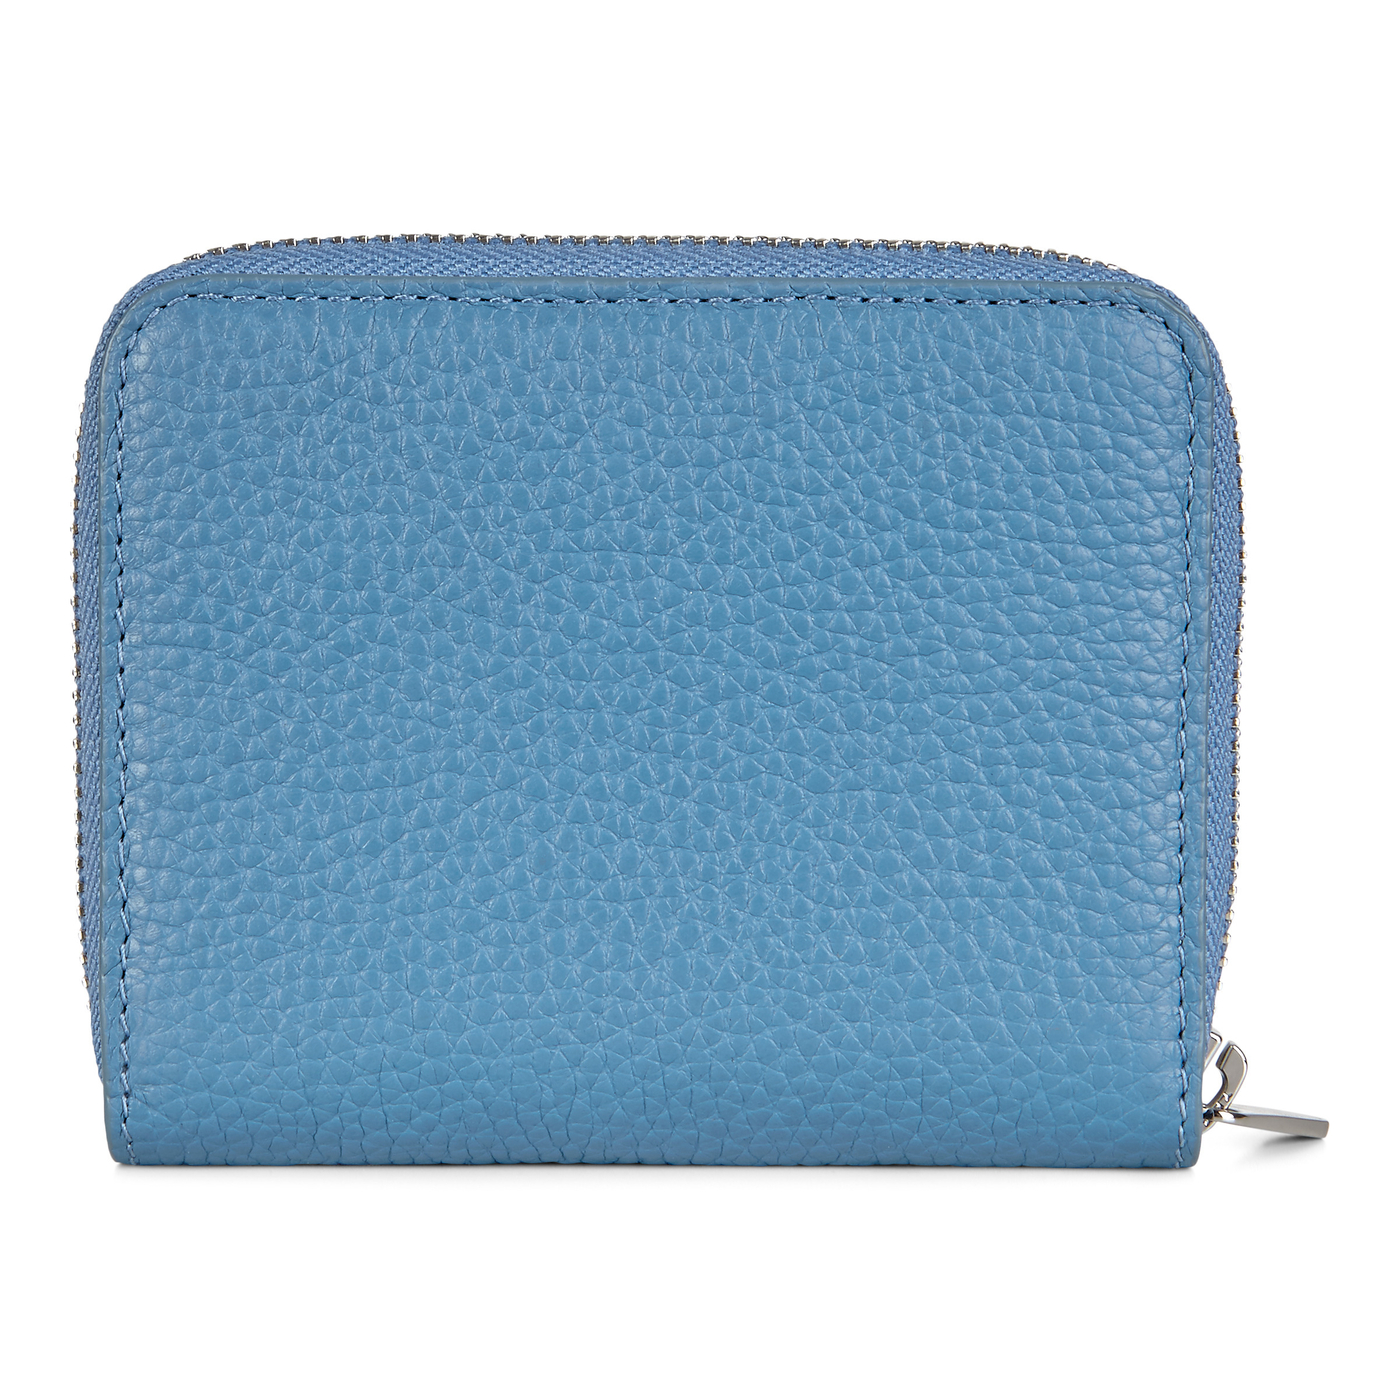 ECCO SP 3 Small Zip Around Wallet